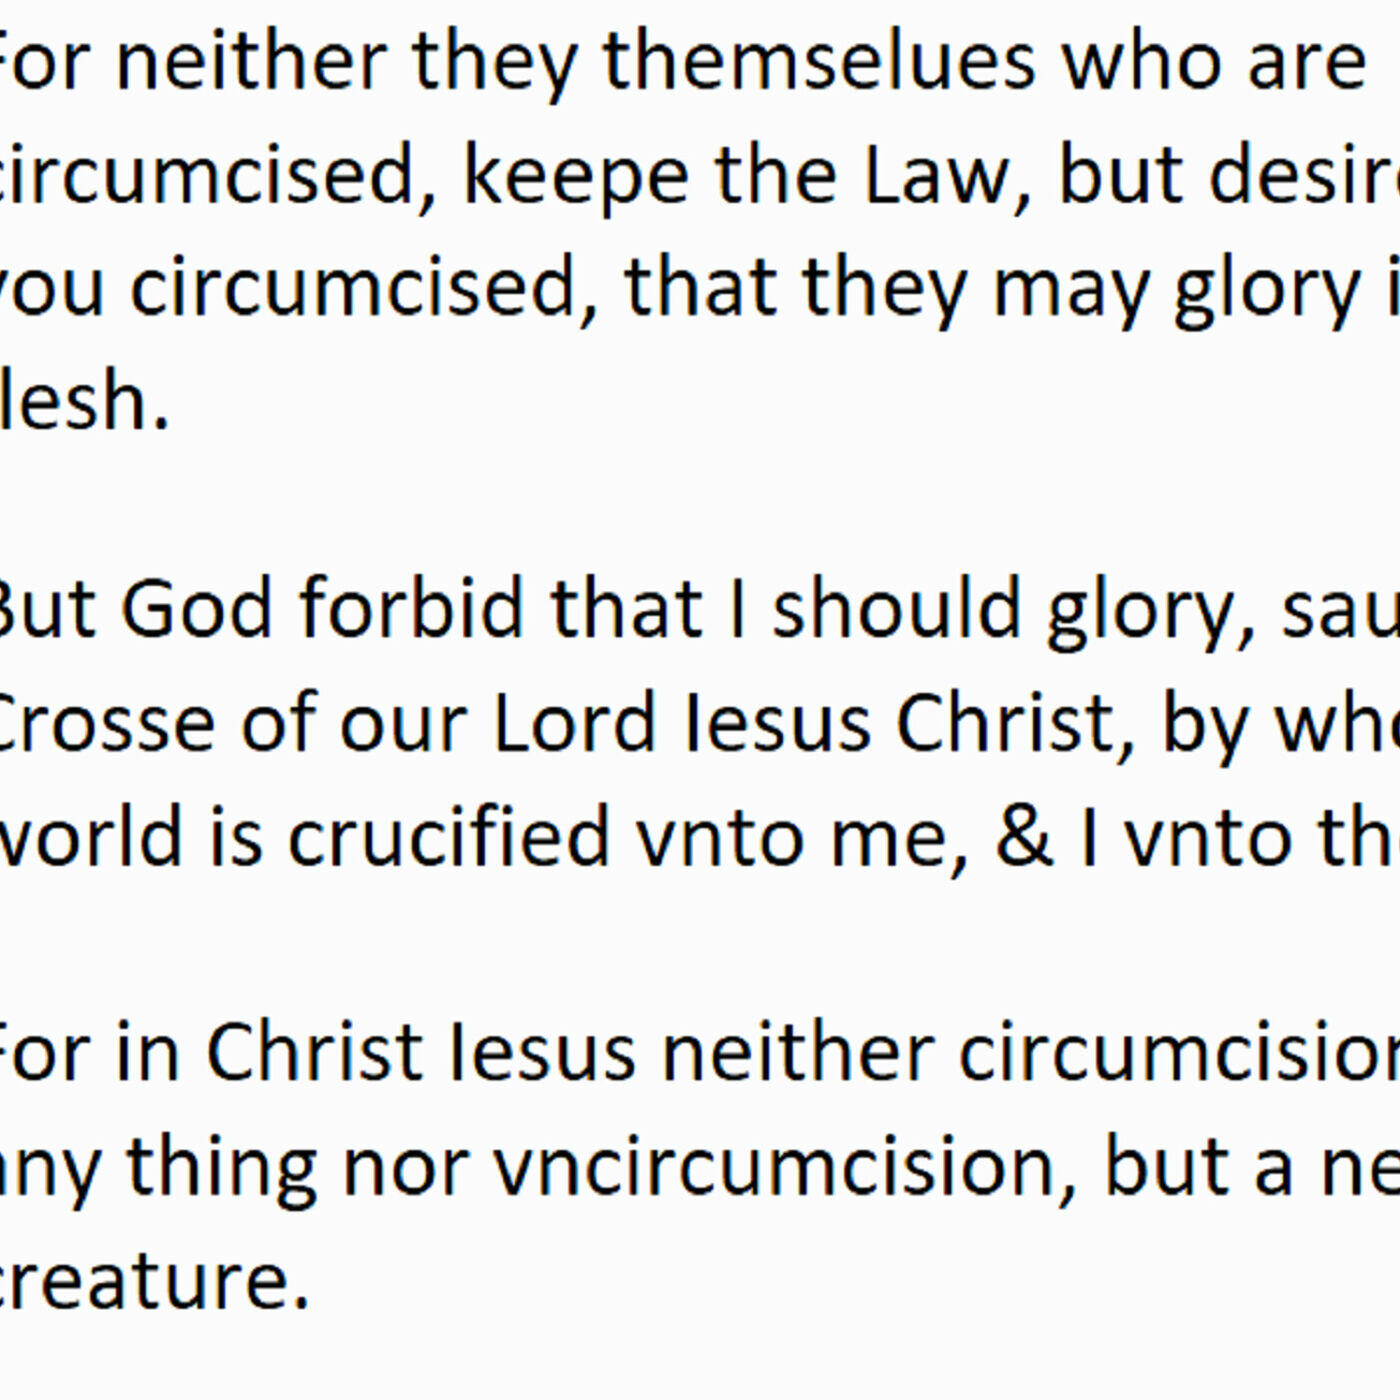 Jesus is the Christ.